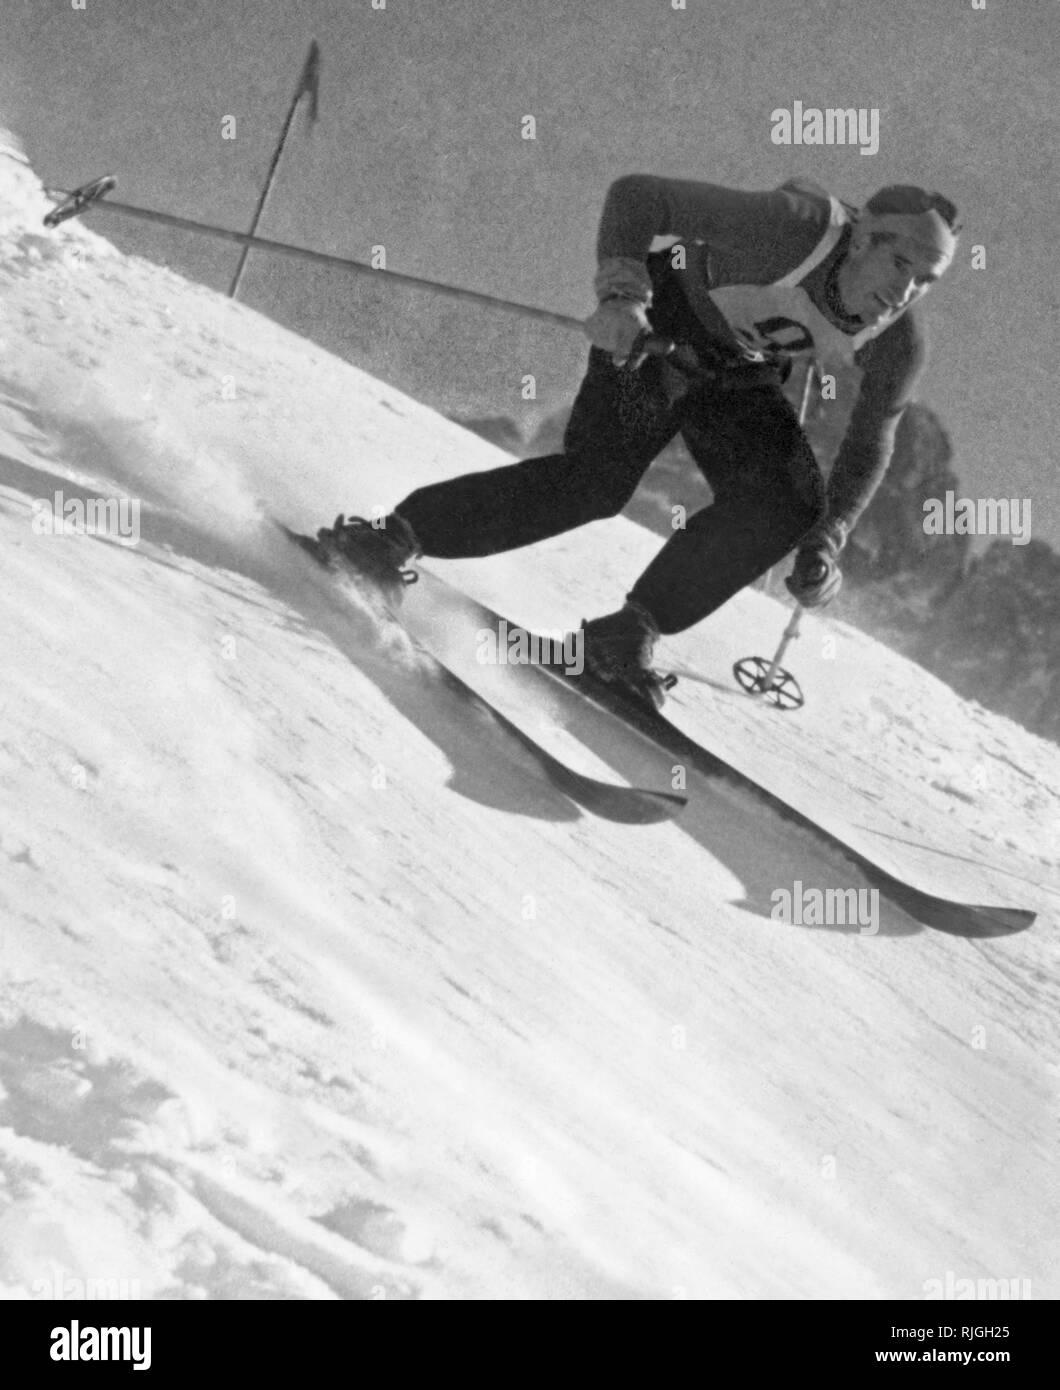 ski, 1940 - Stock Image